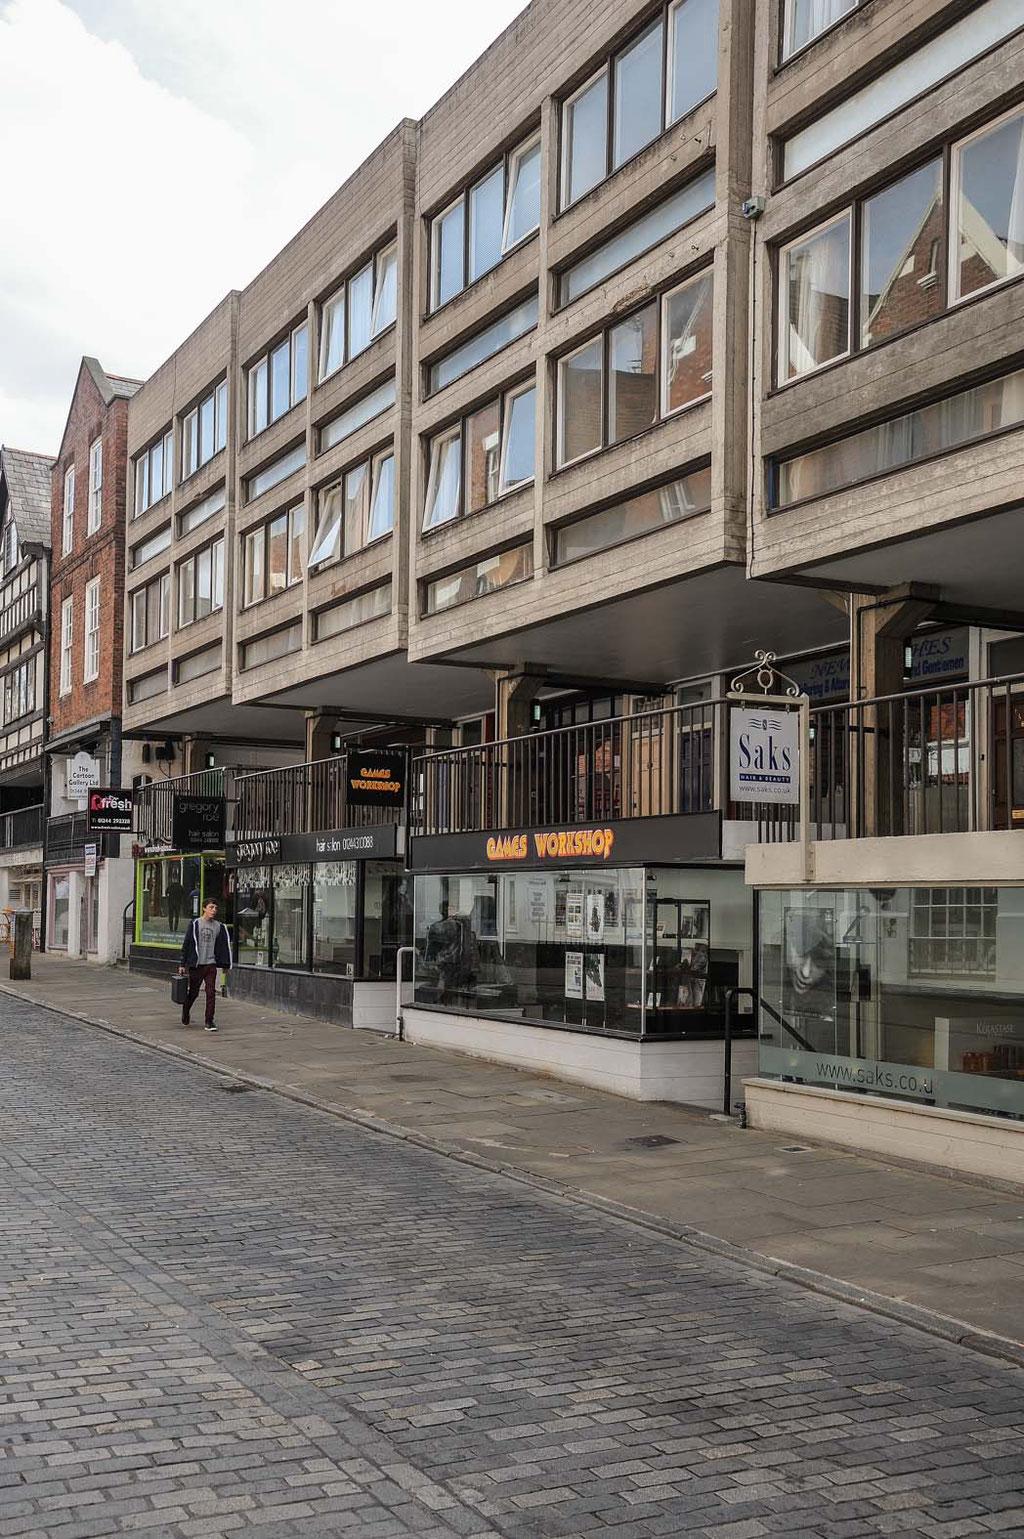 Watergate Street, Chester (UK)